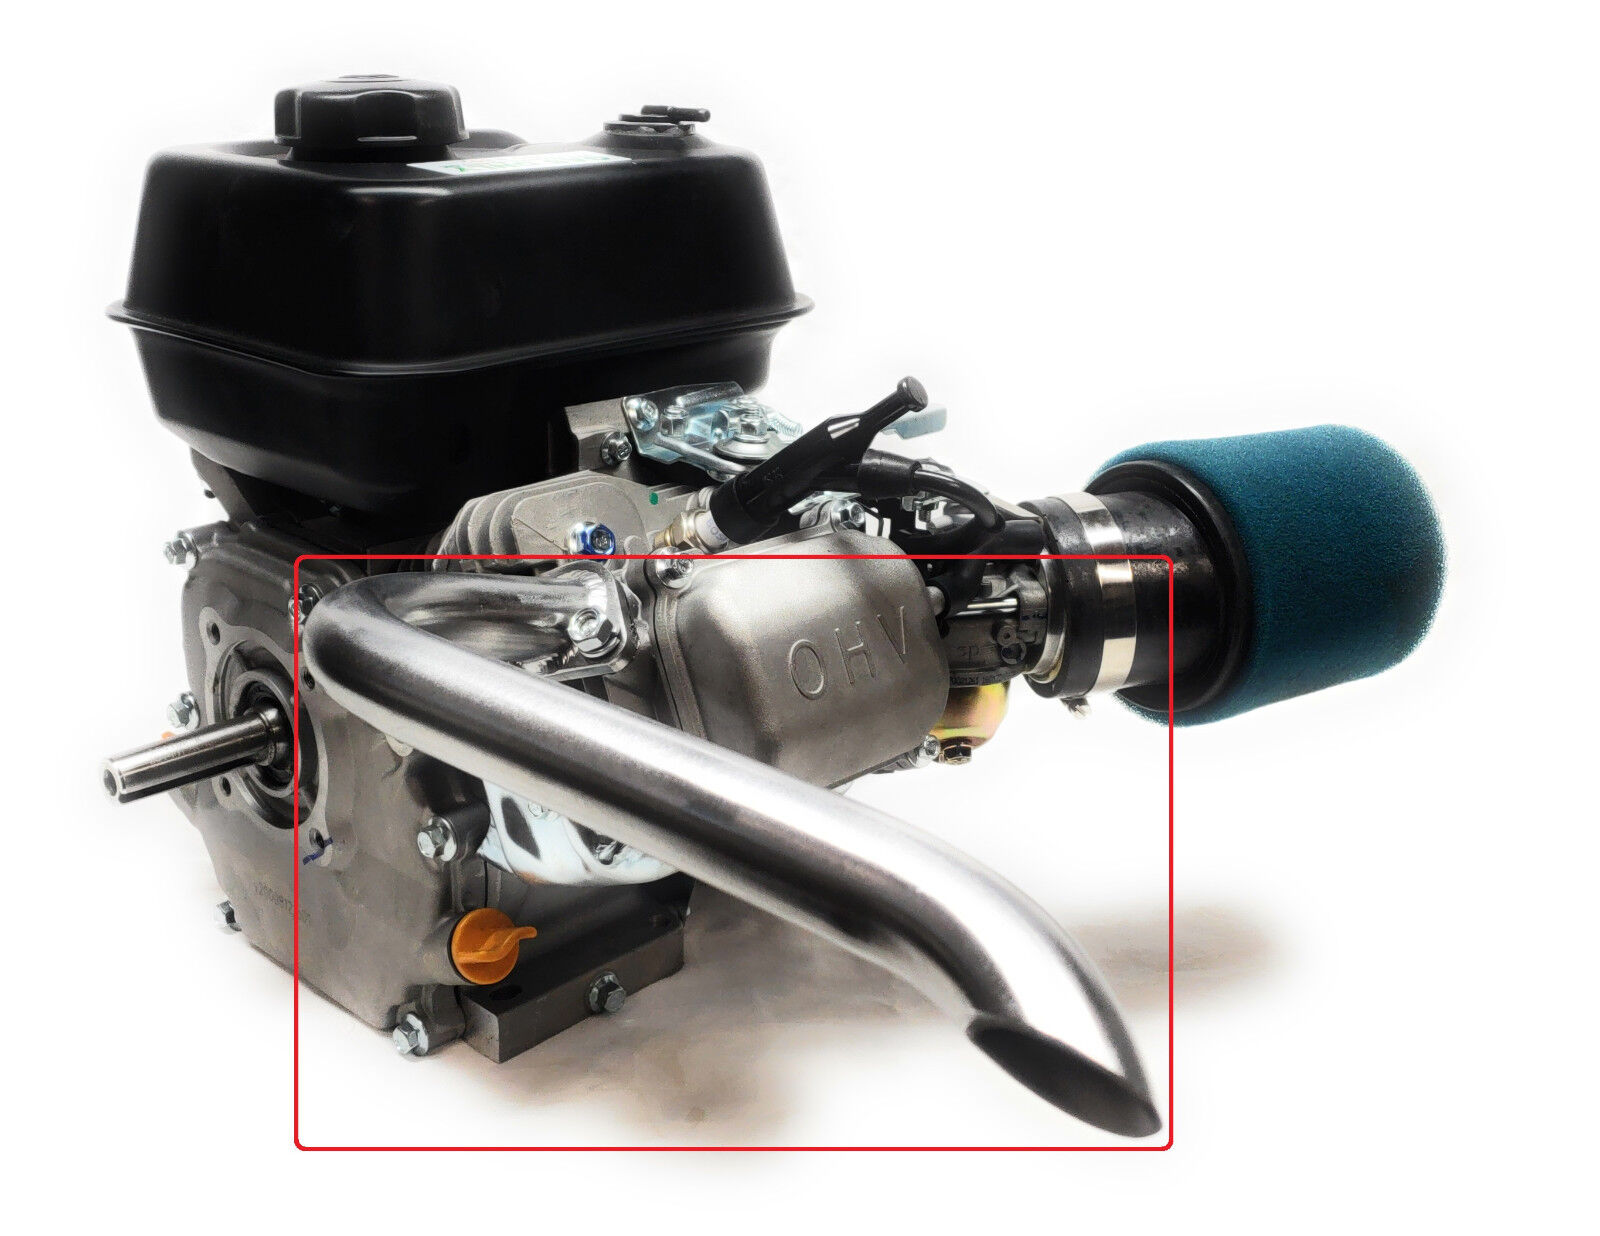 Mini Bike Exhaust Header Pipe for: Predator 212cc, Honda GX1